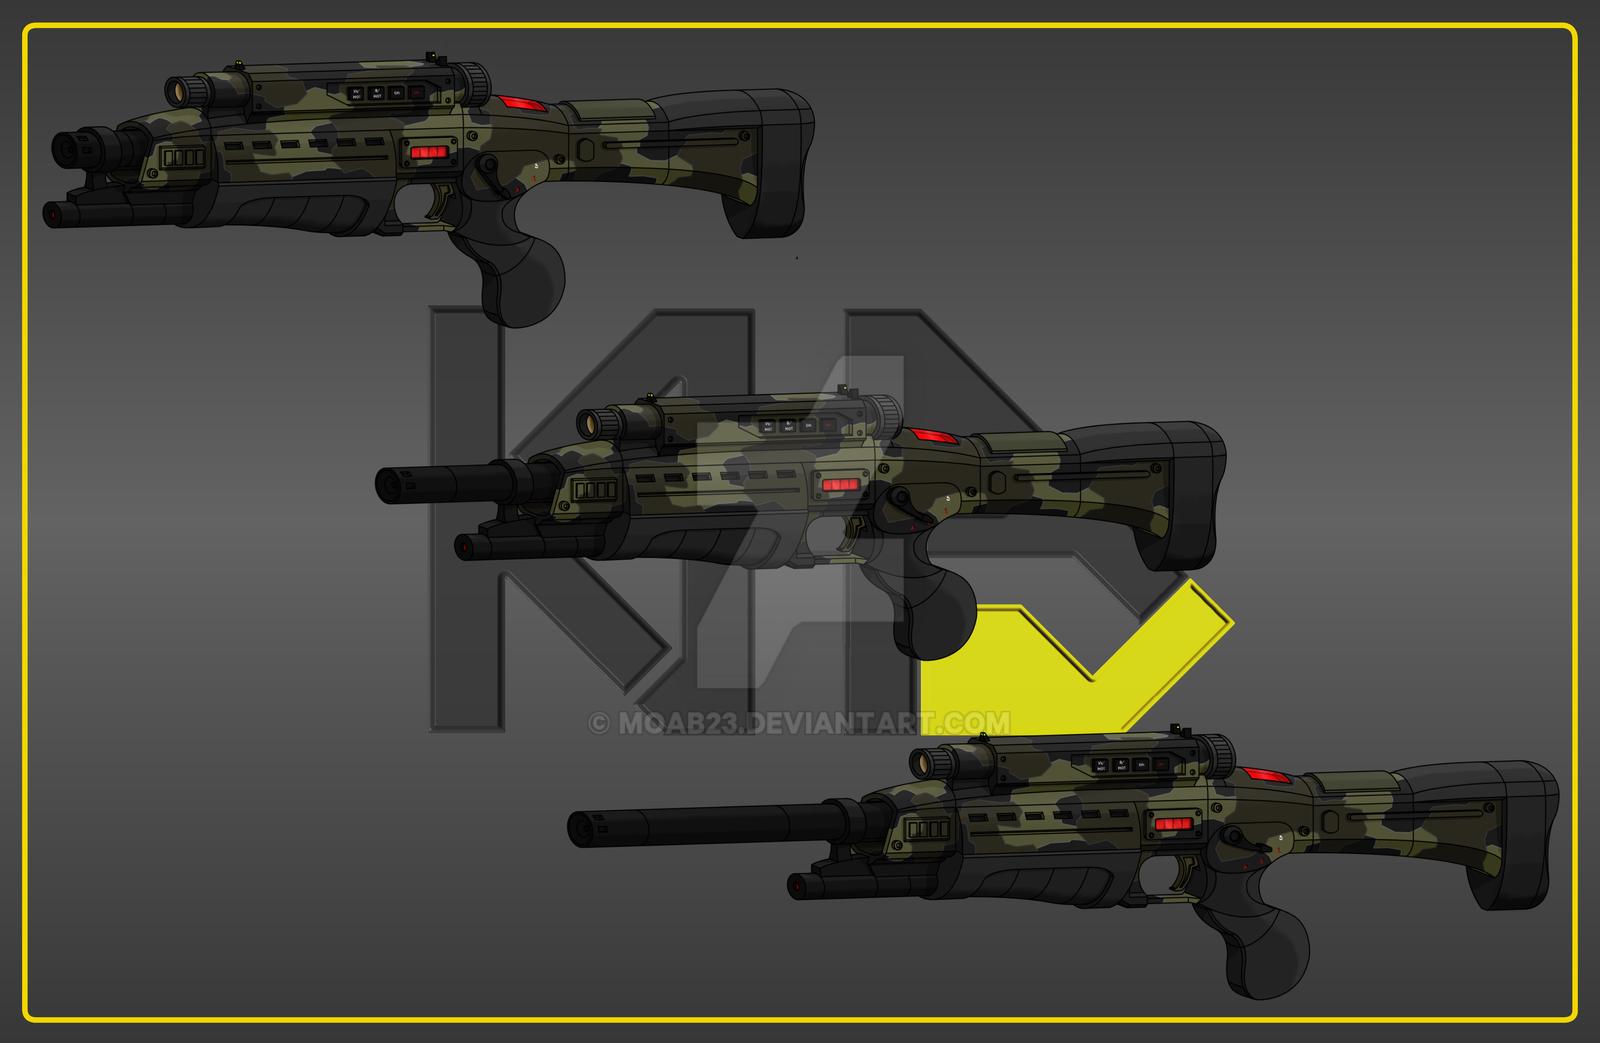 X-1 KAR by MOAB23